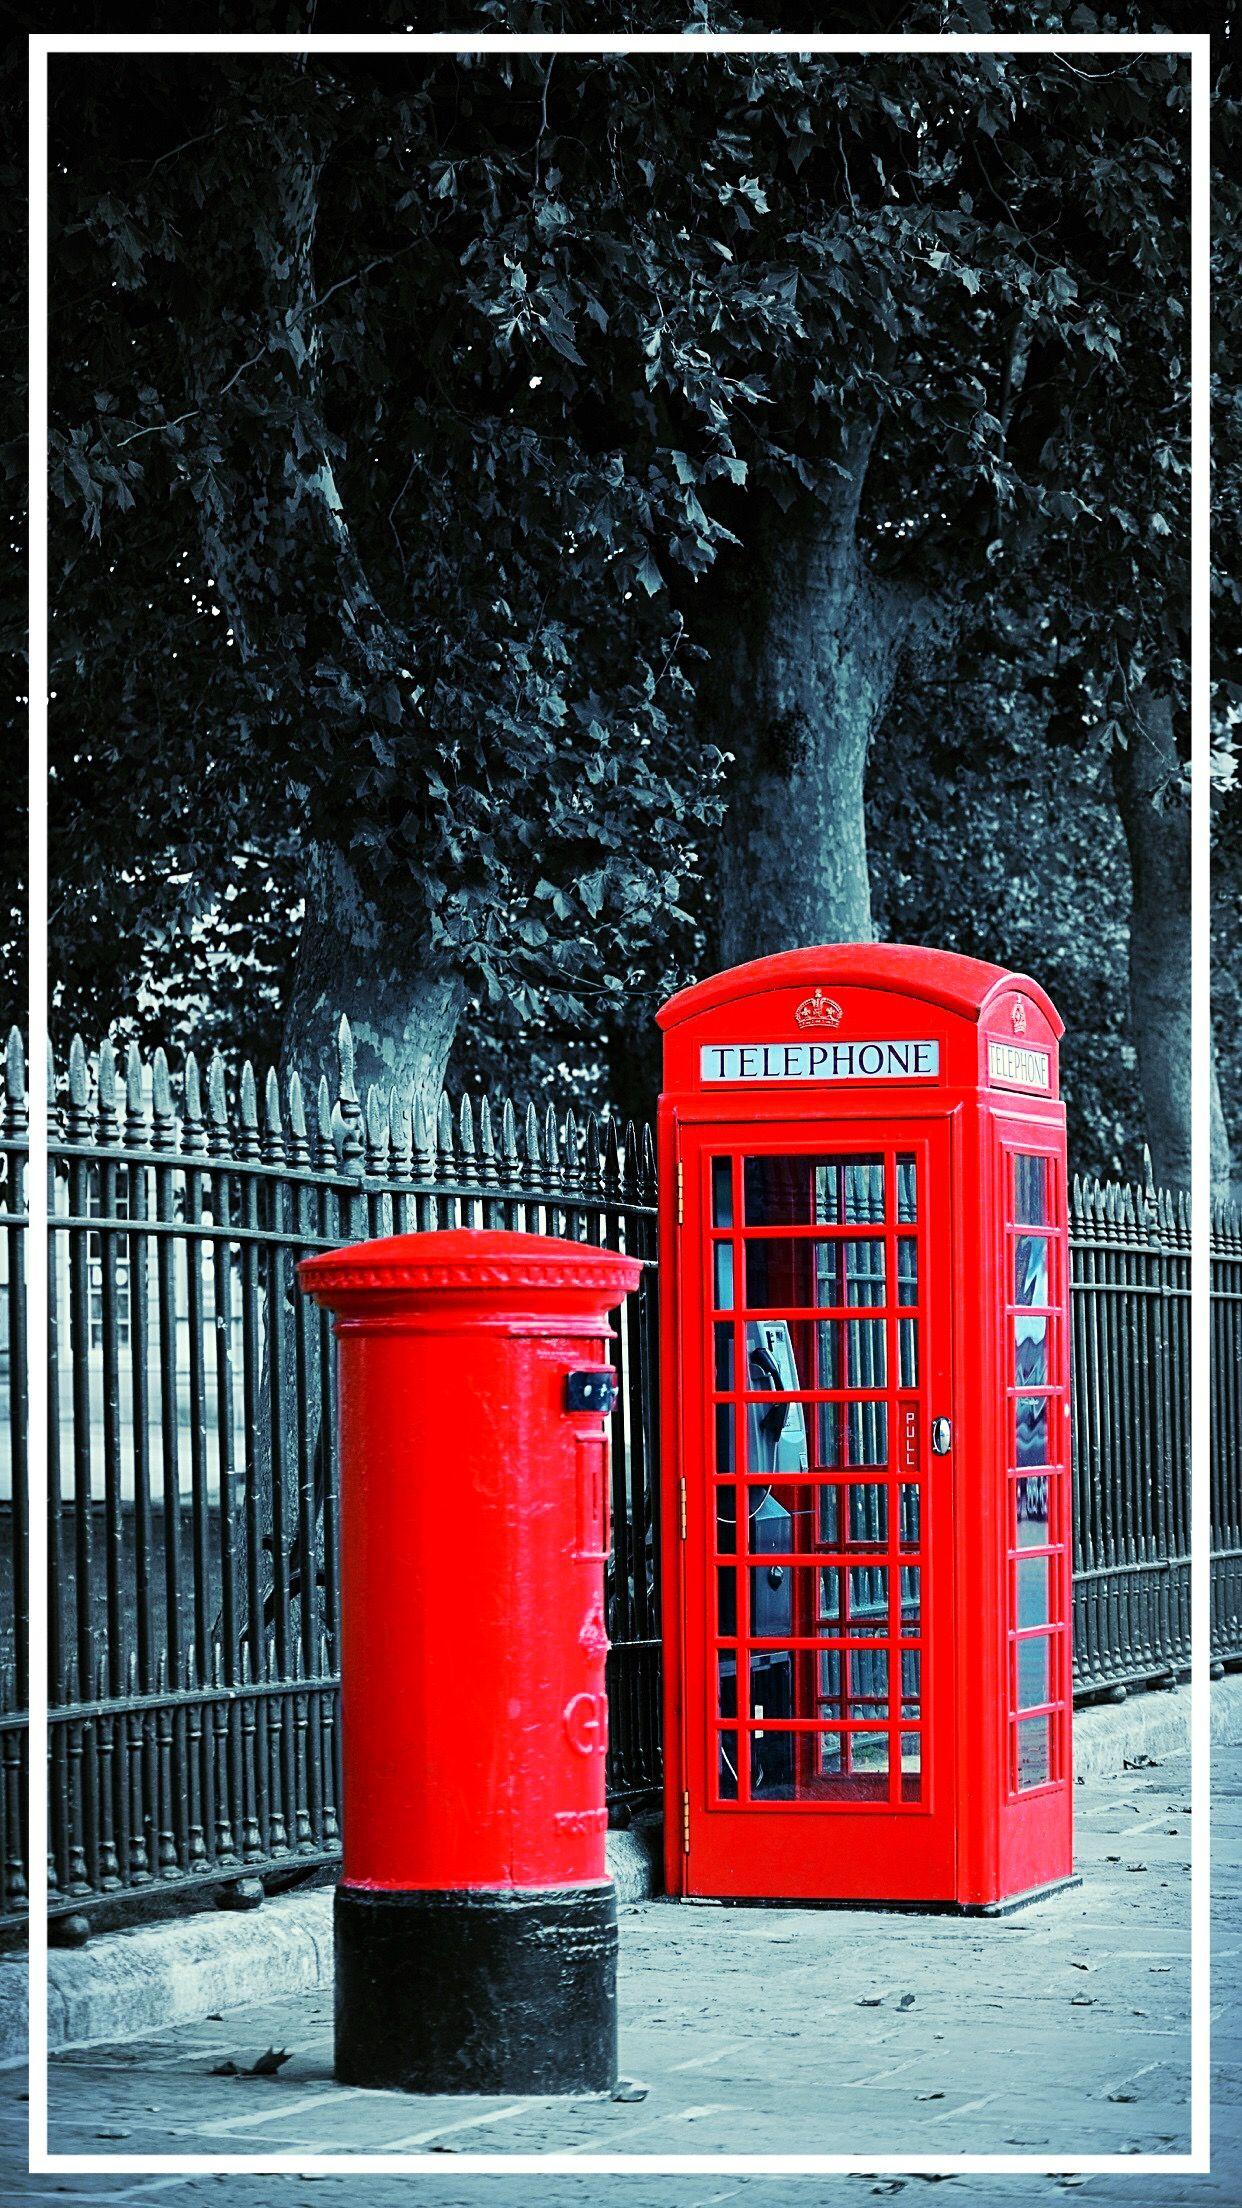 Real London Iphone background, Ipad wallpaper, Locker